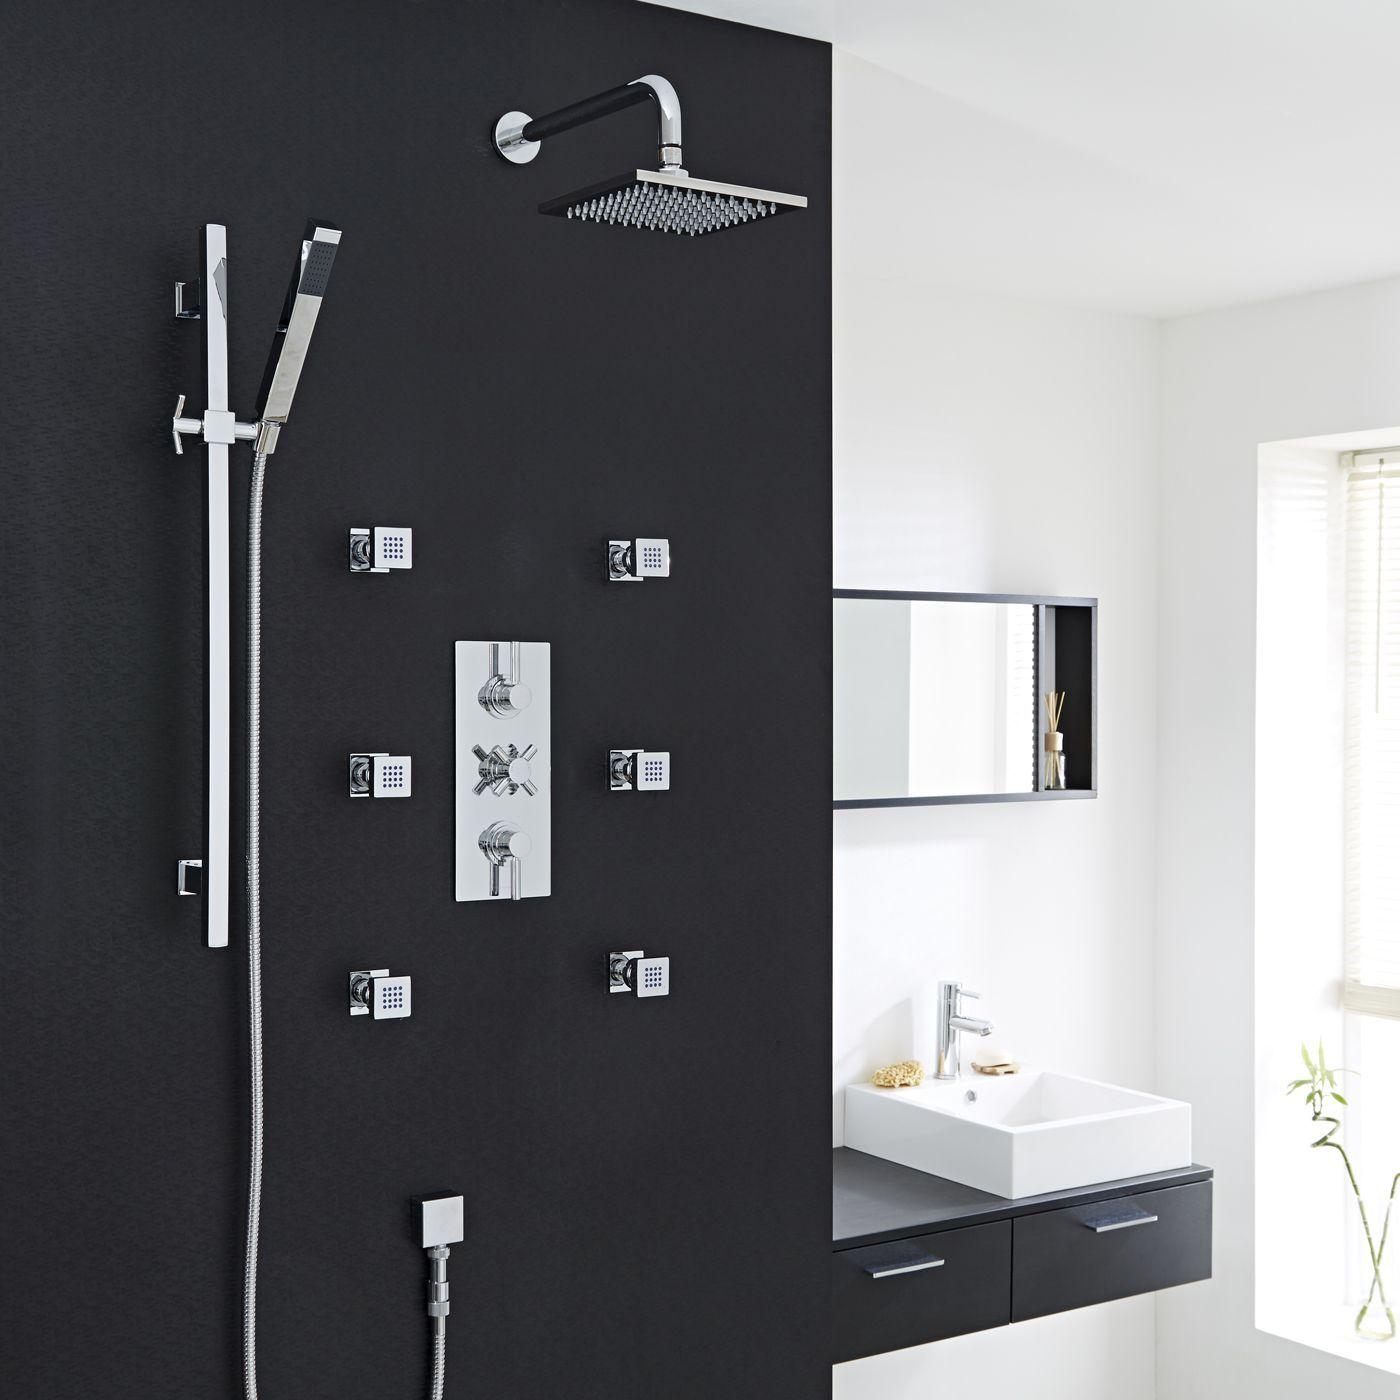 Thermostatic Shower System with Slide Rail Kit & 6 Square Jet Sprays